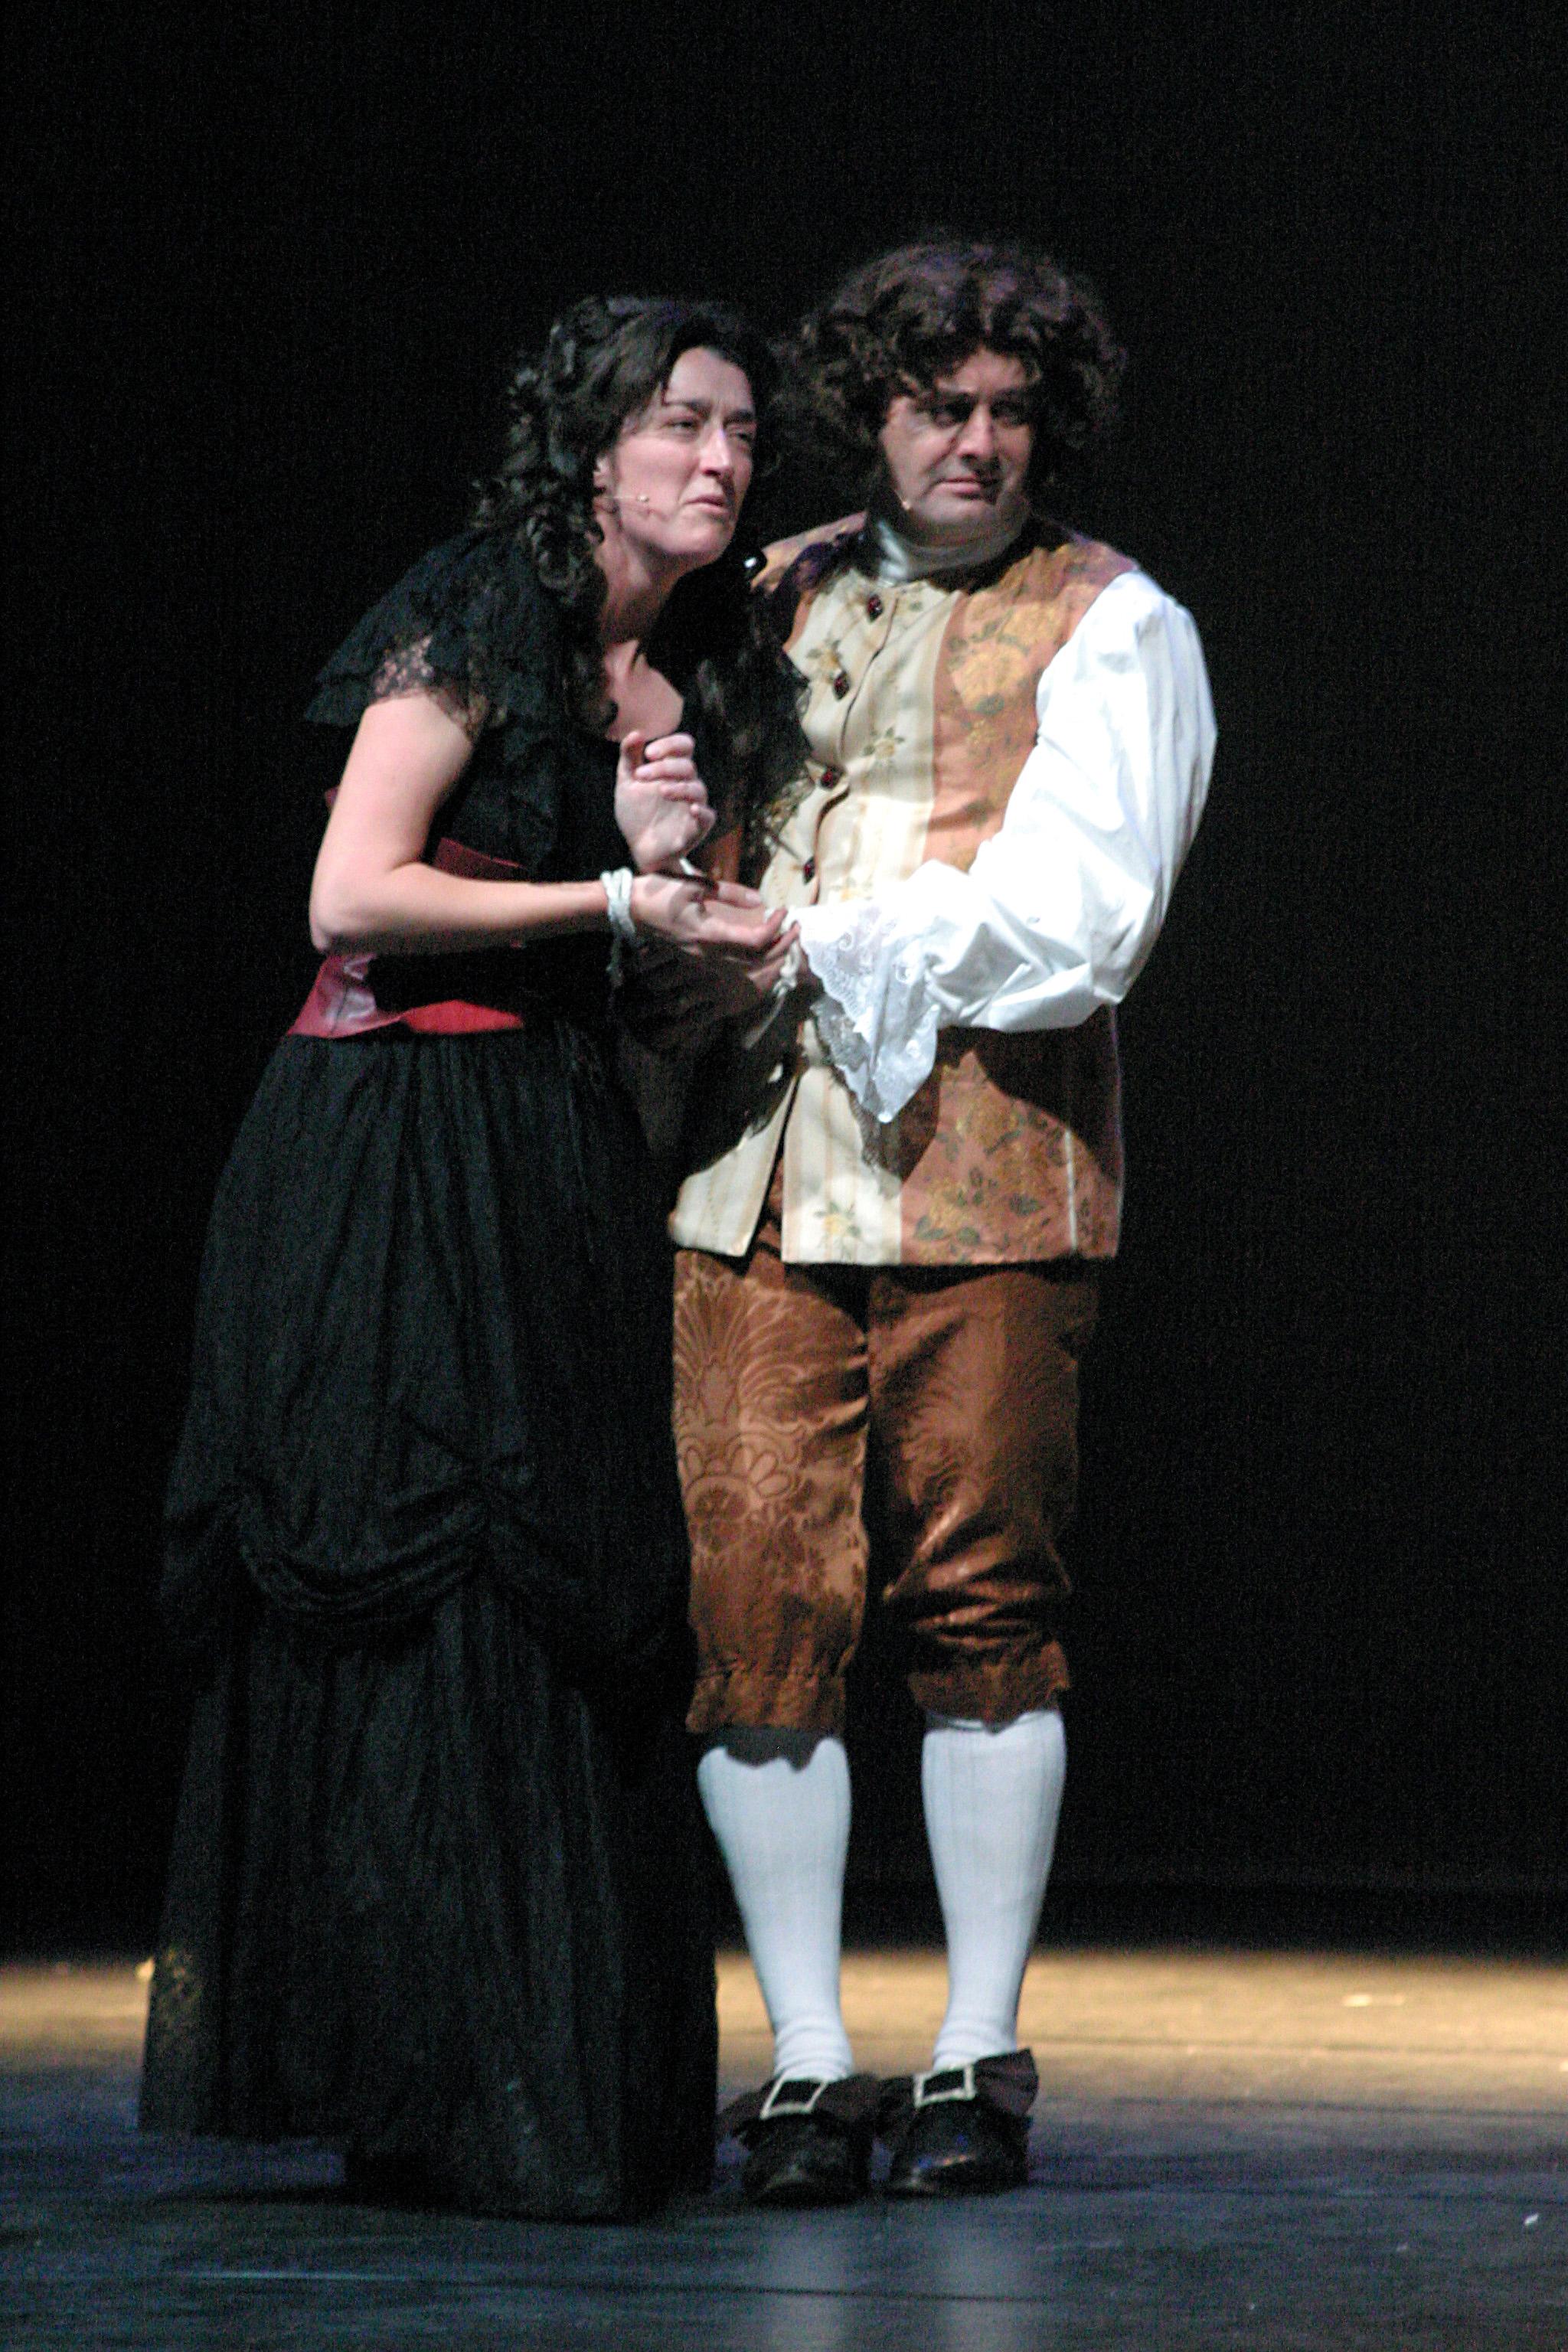 097 - The Scarlet Pimpernel 2005 - Generale.jpg